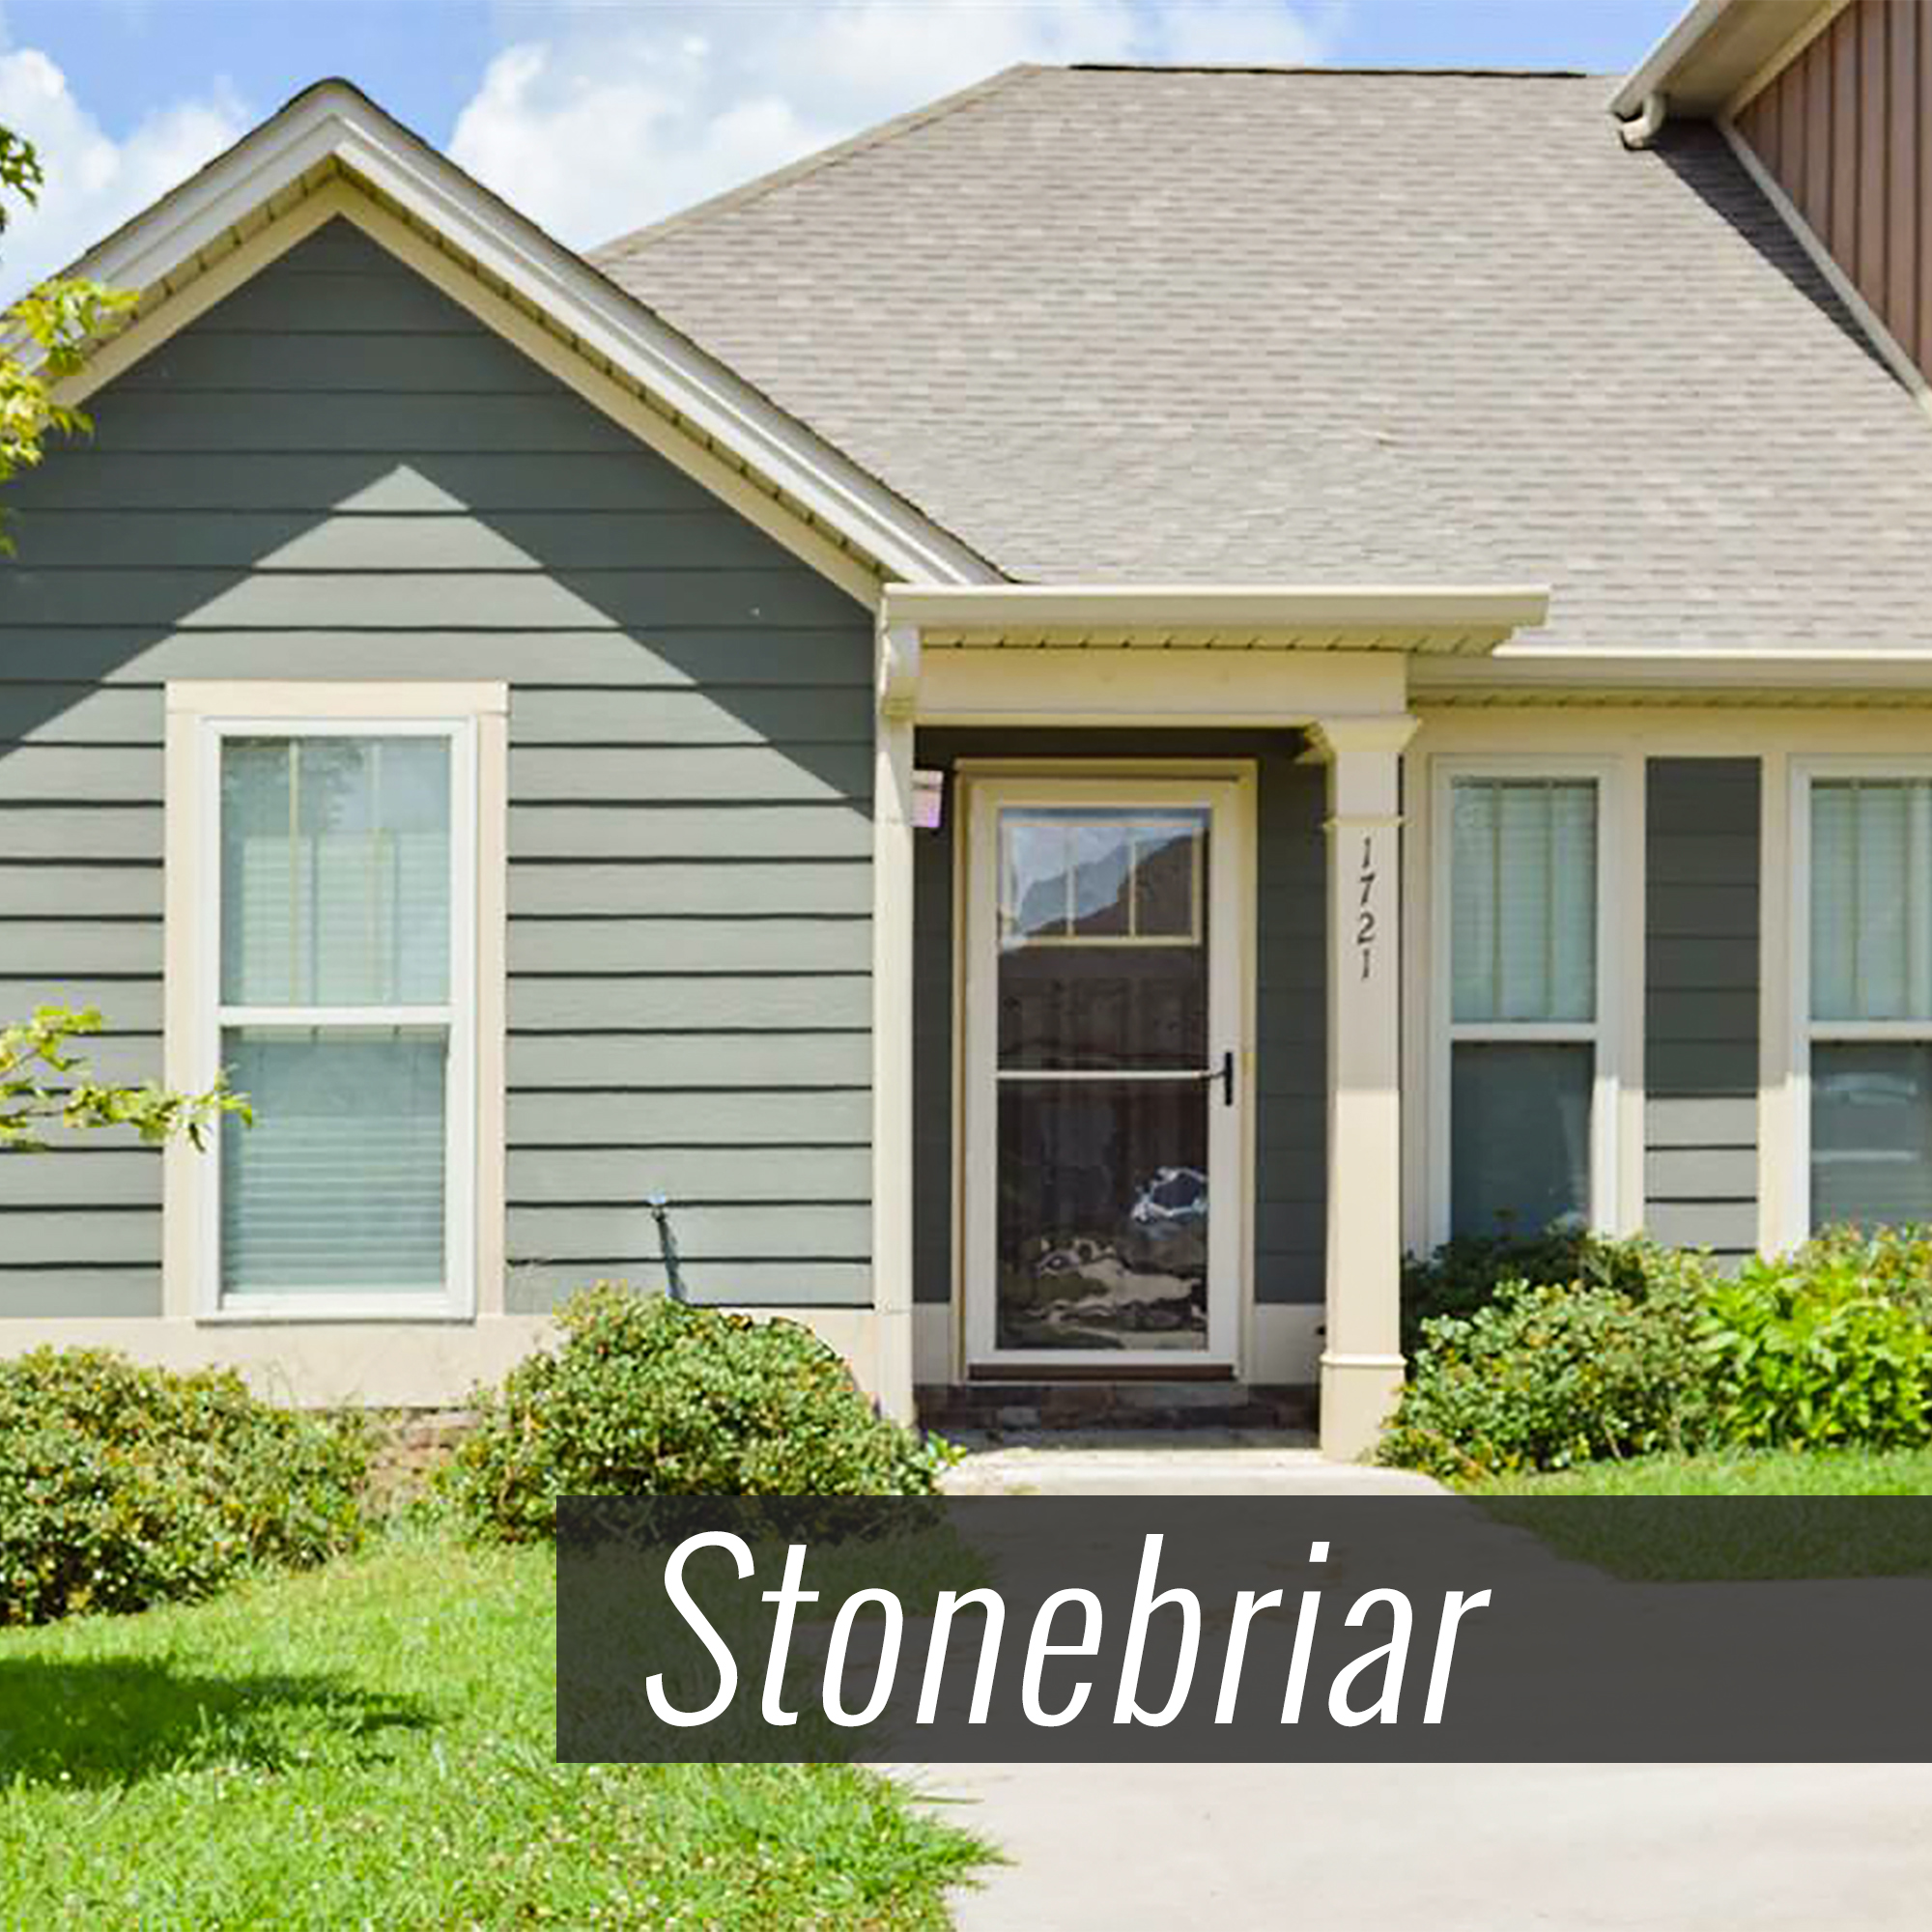 Homes for Sale in Stonebriar Subdivision